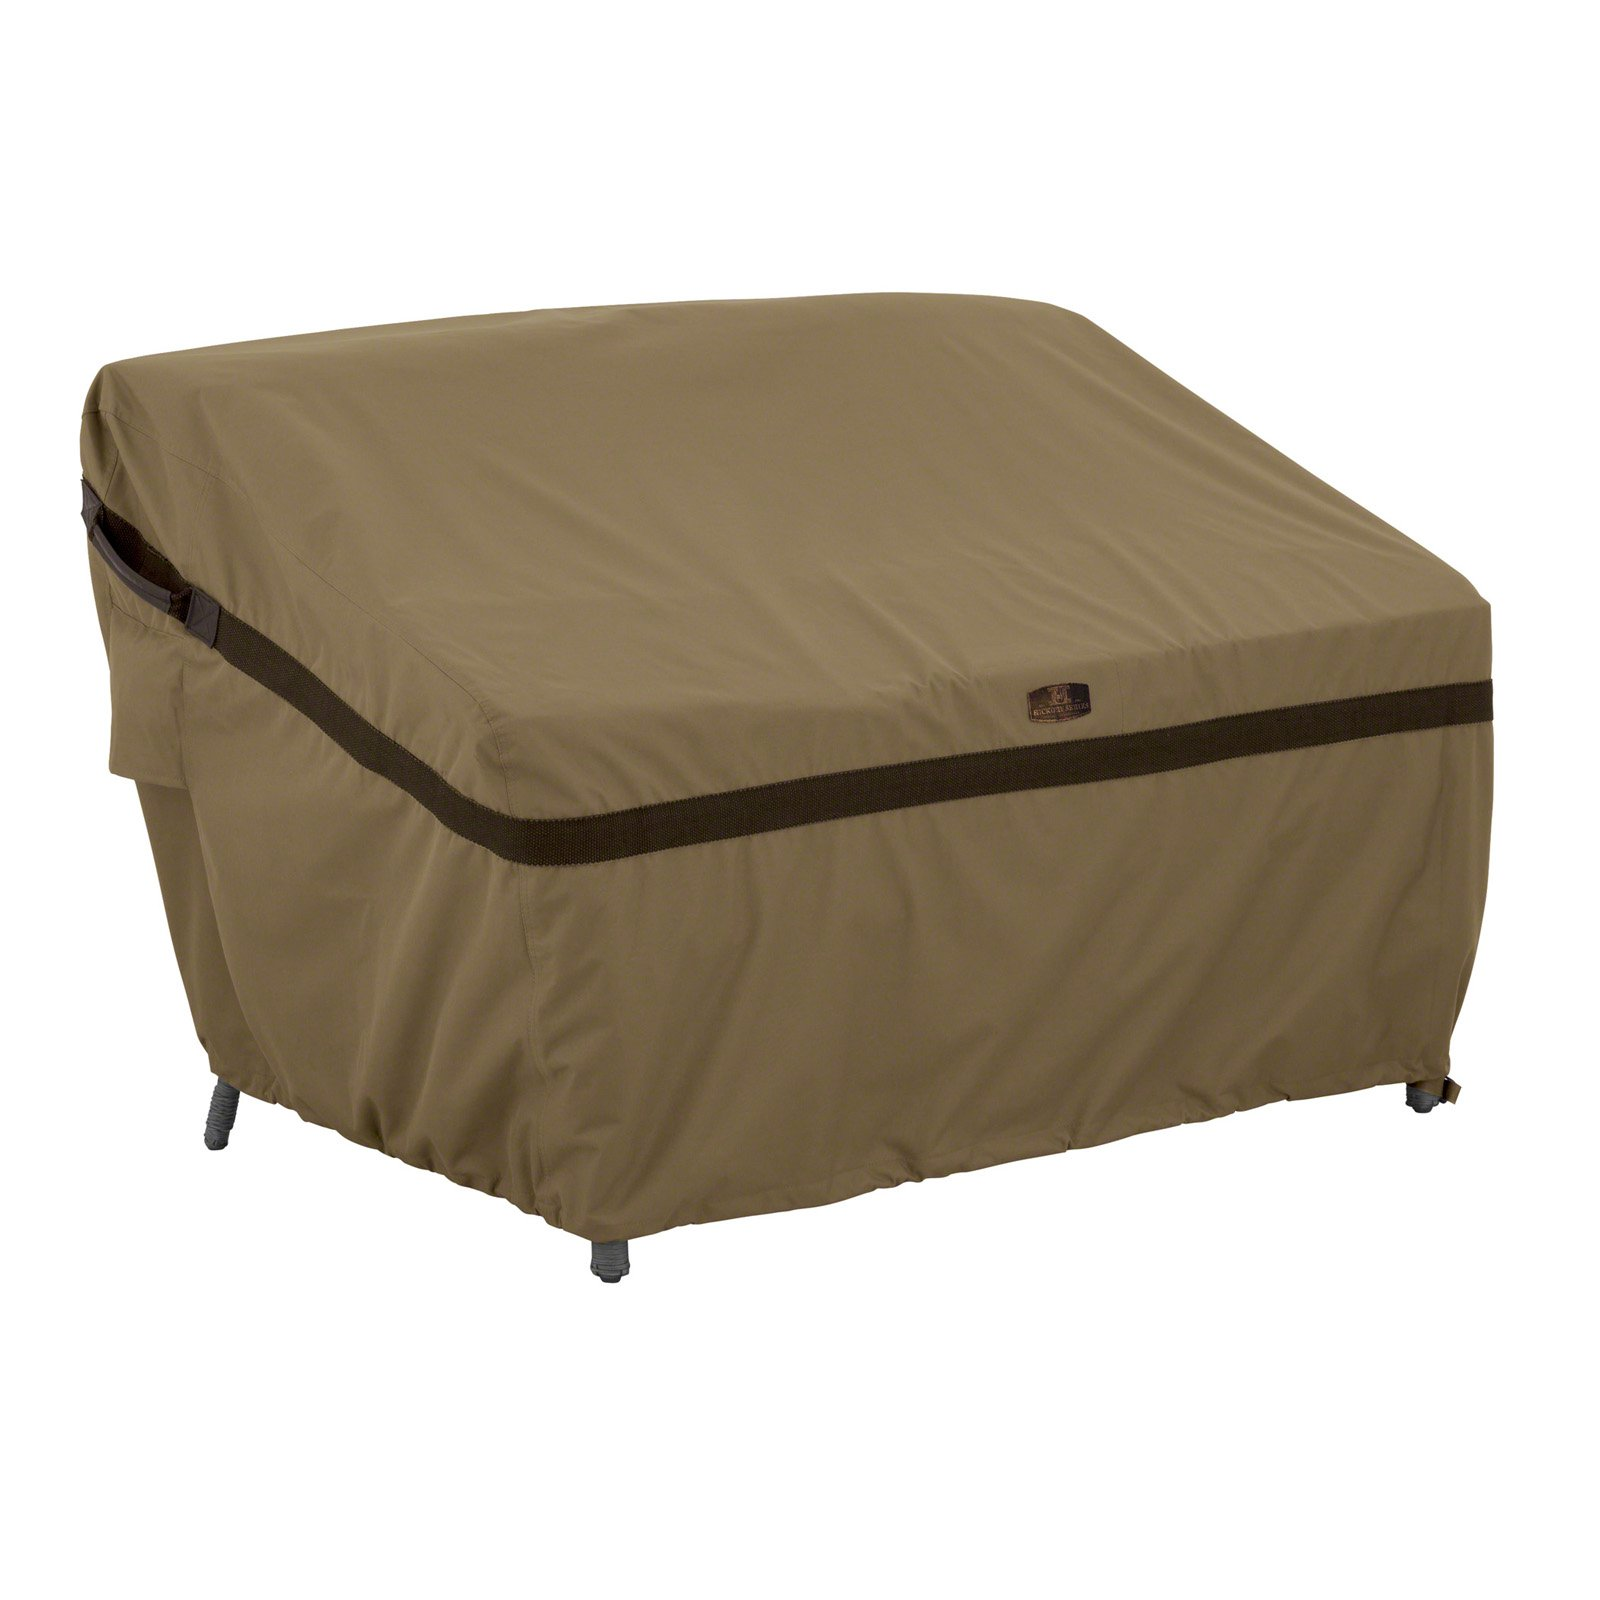 Classic Accessories Hickory Patio Sofa Loveseat Furniture Storage Cover Small Tan Com